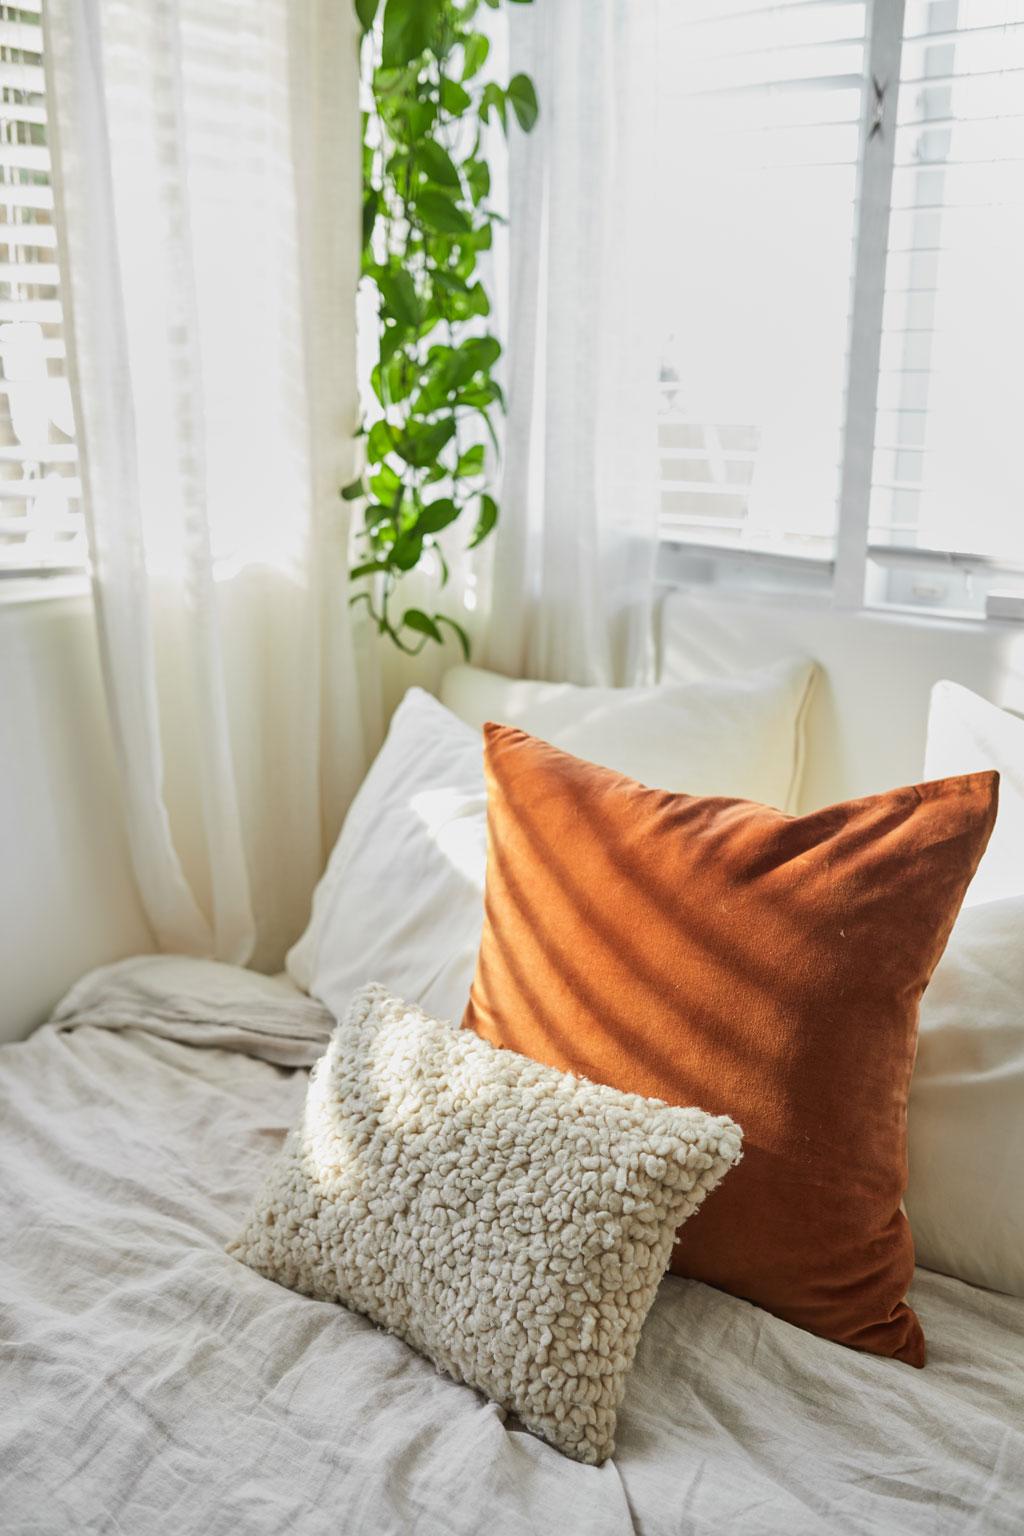 Apartment-List_Day1_0361-2.jpg